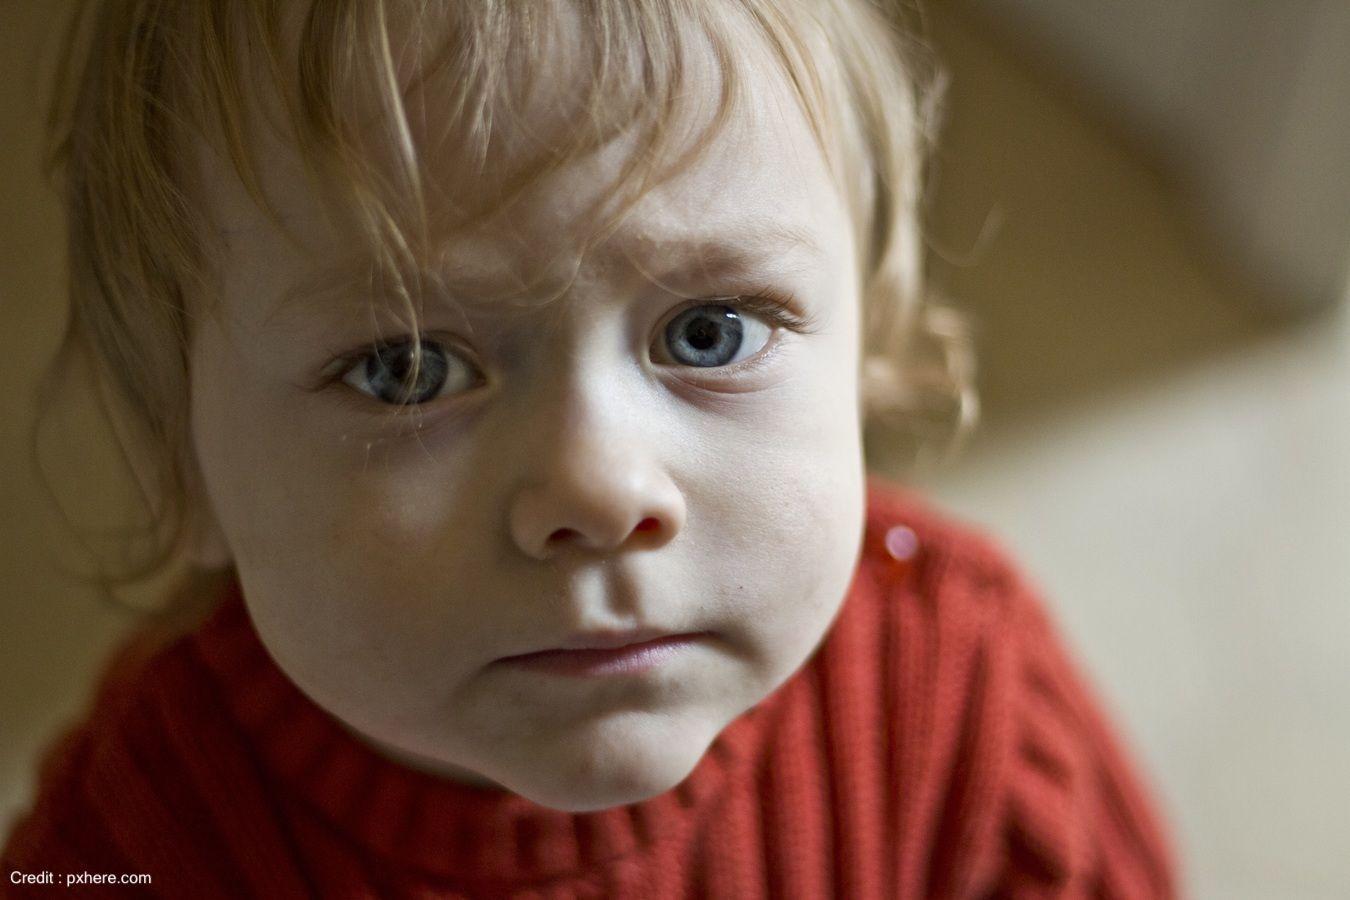 Close up shot of a baby